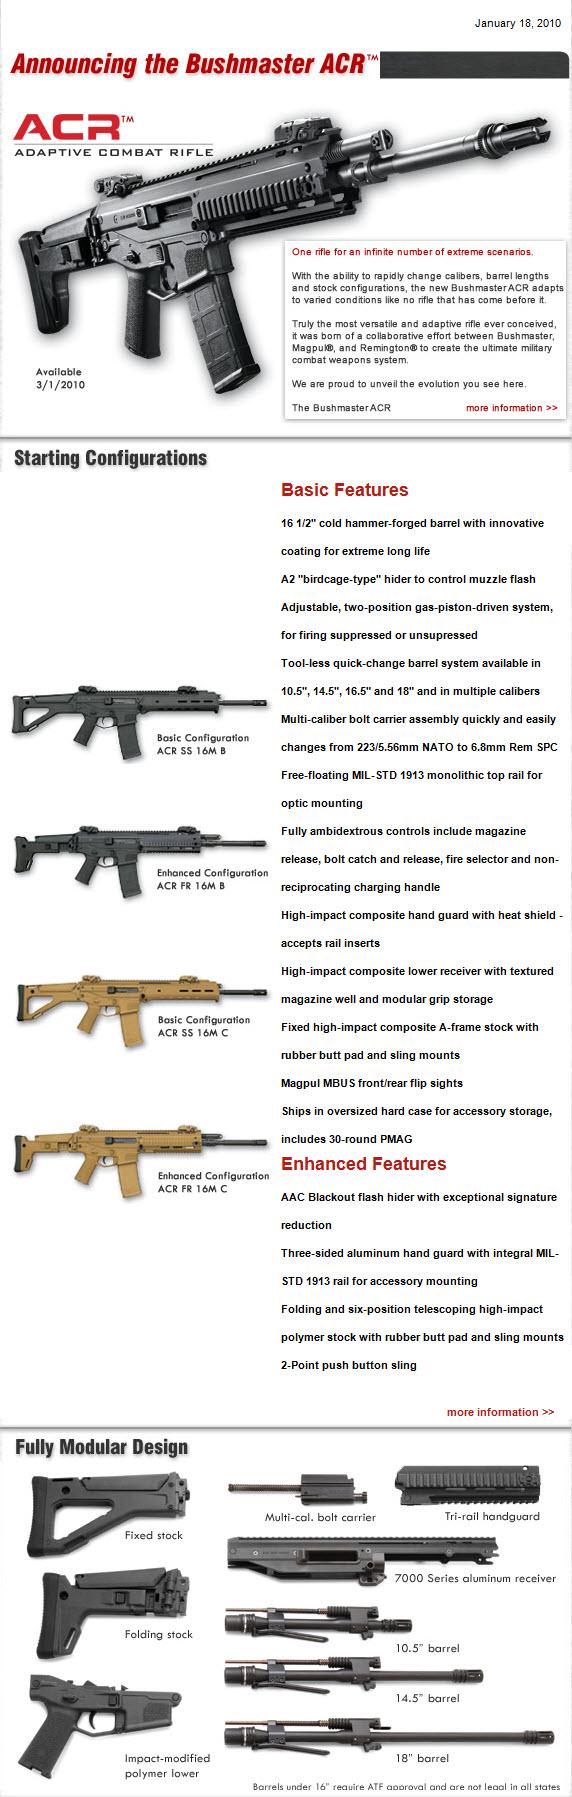 CombatRifle net - Remington ACR, Bushmaster ACR, Magpul